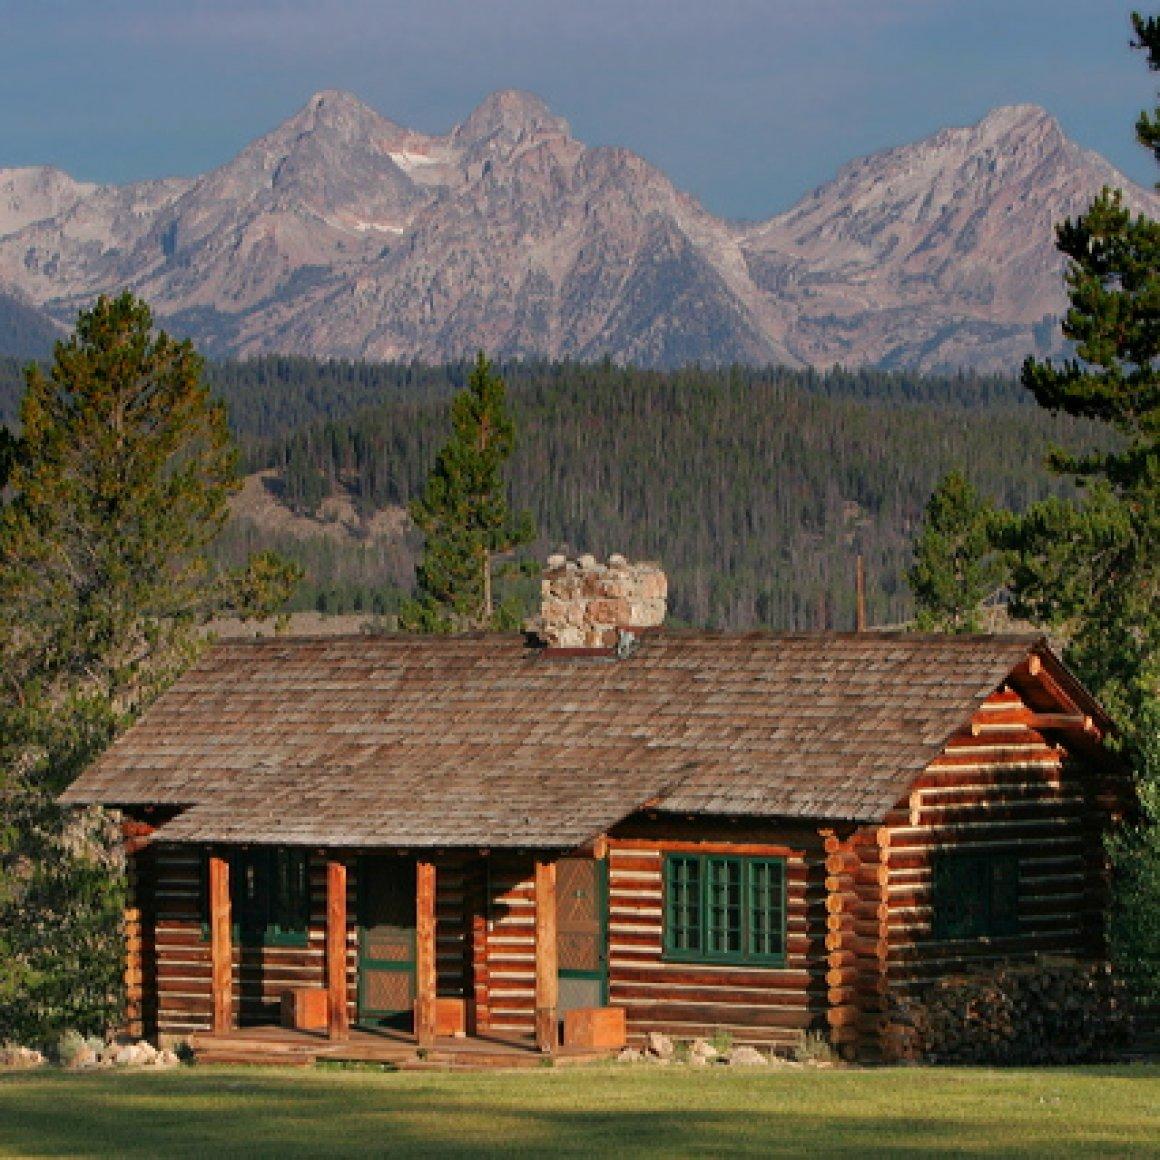 Idaho Rocky Mountain Ranch - Mountain Humane